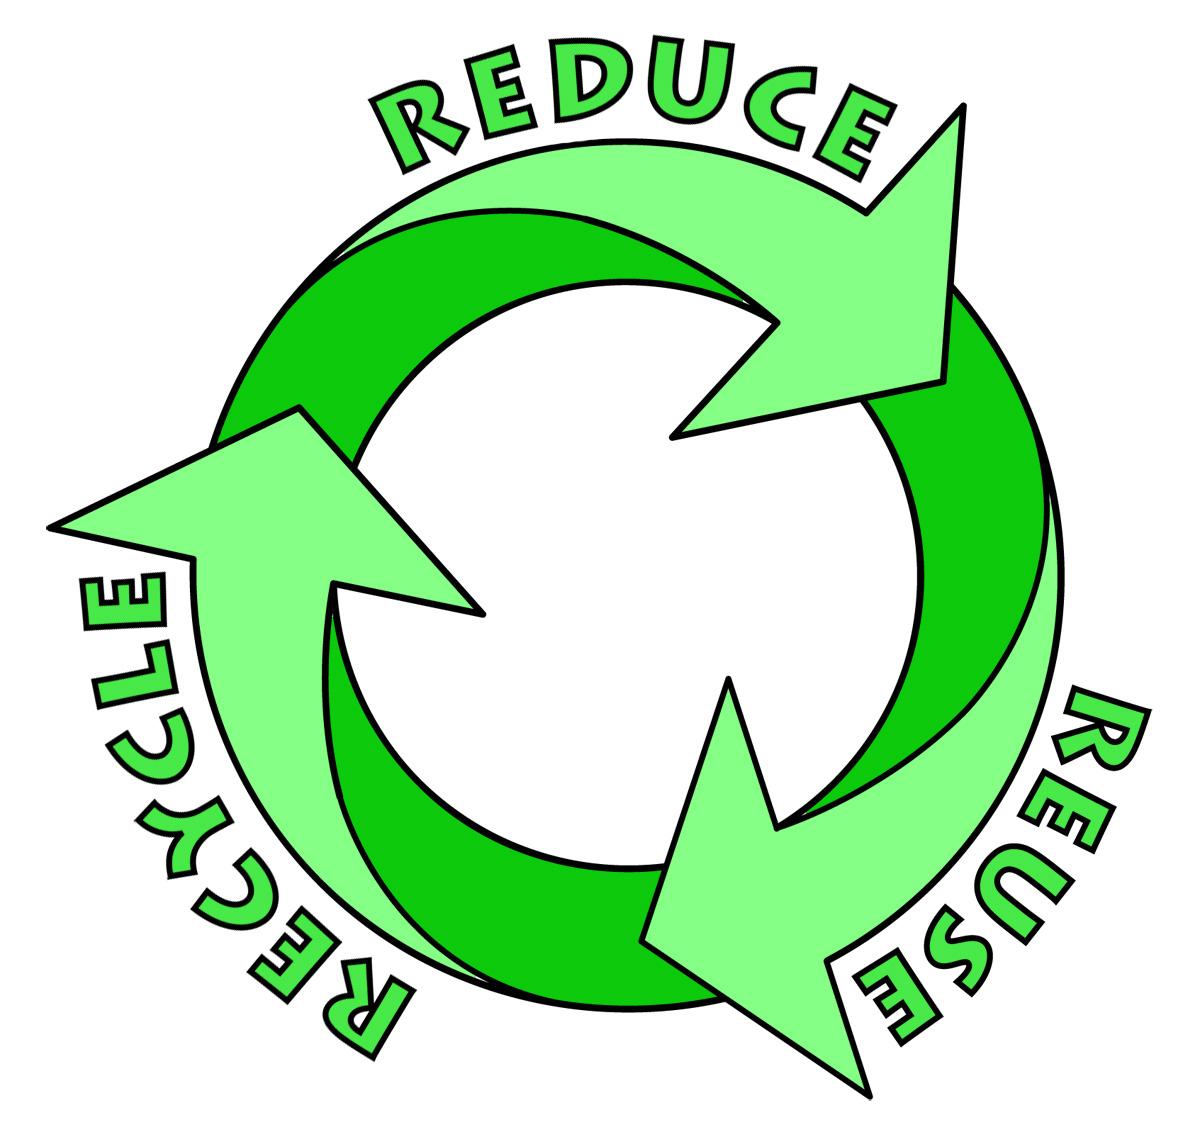 Ringier Plastics and Rubber (www.industrysourcing.com/plastics ...